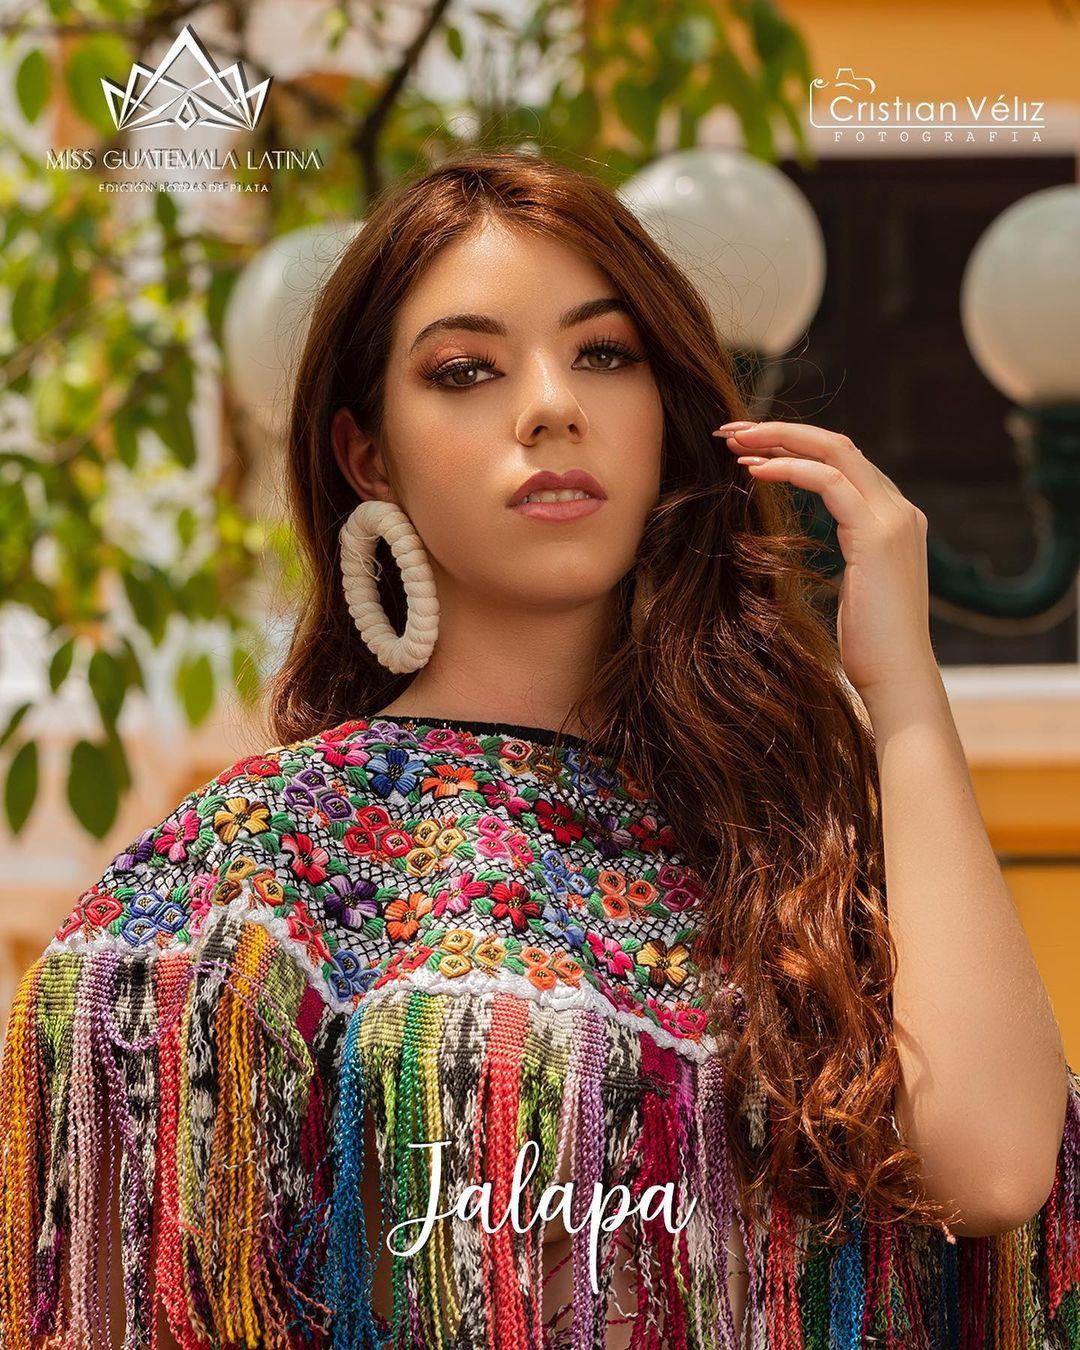 candidatas a miss guatemala latina 2021. final: 30 de abril. - Página 2 B2gNhF